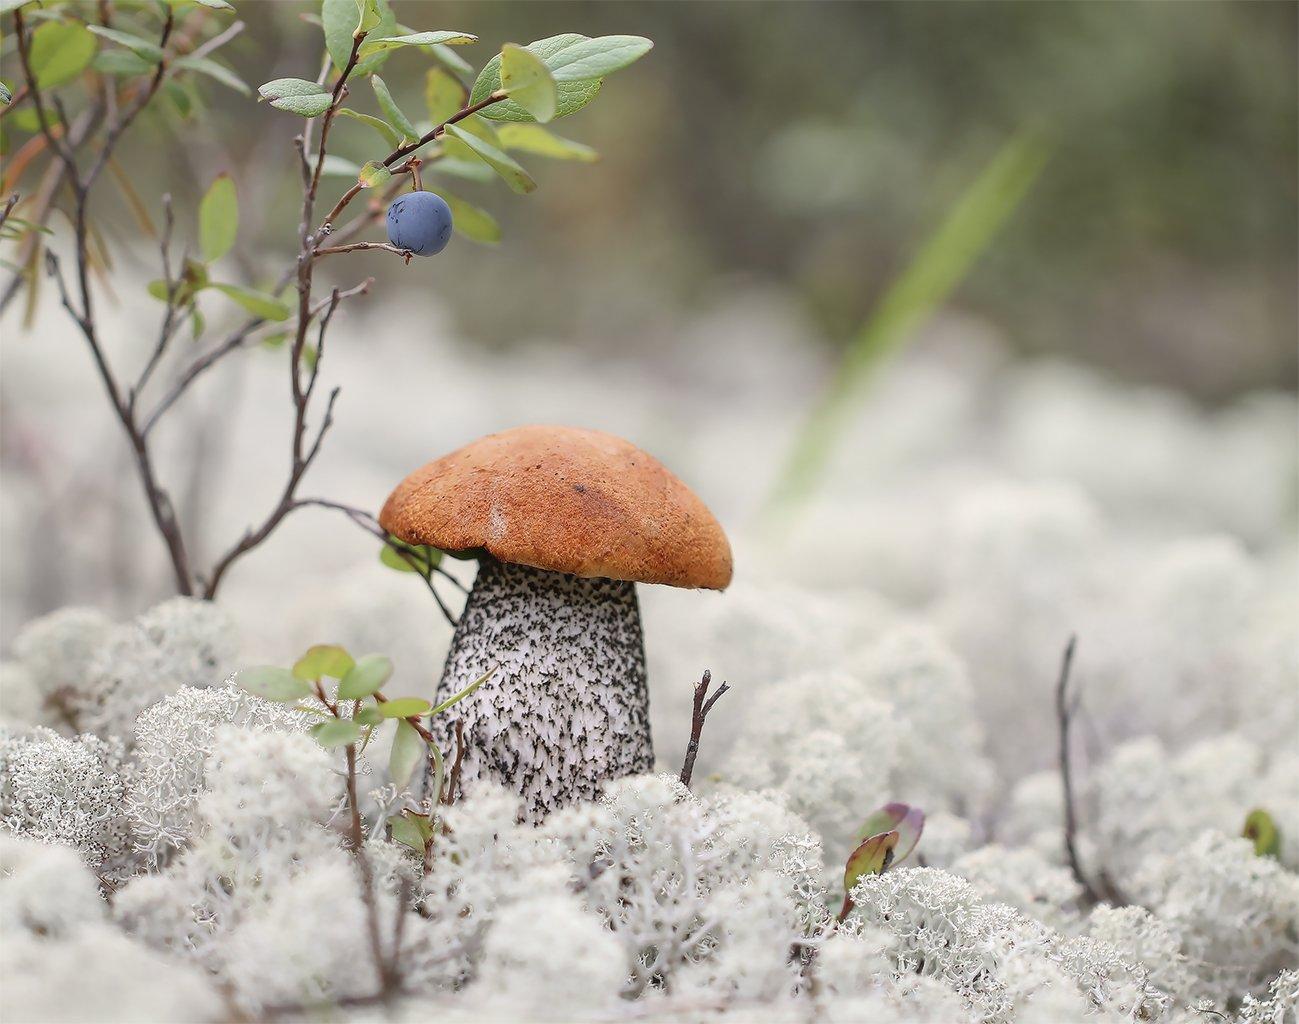 подосиновик, якутия, нерюнгри, голубика, мох, ягель, Евгения Левина